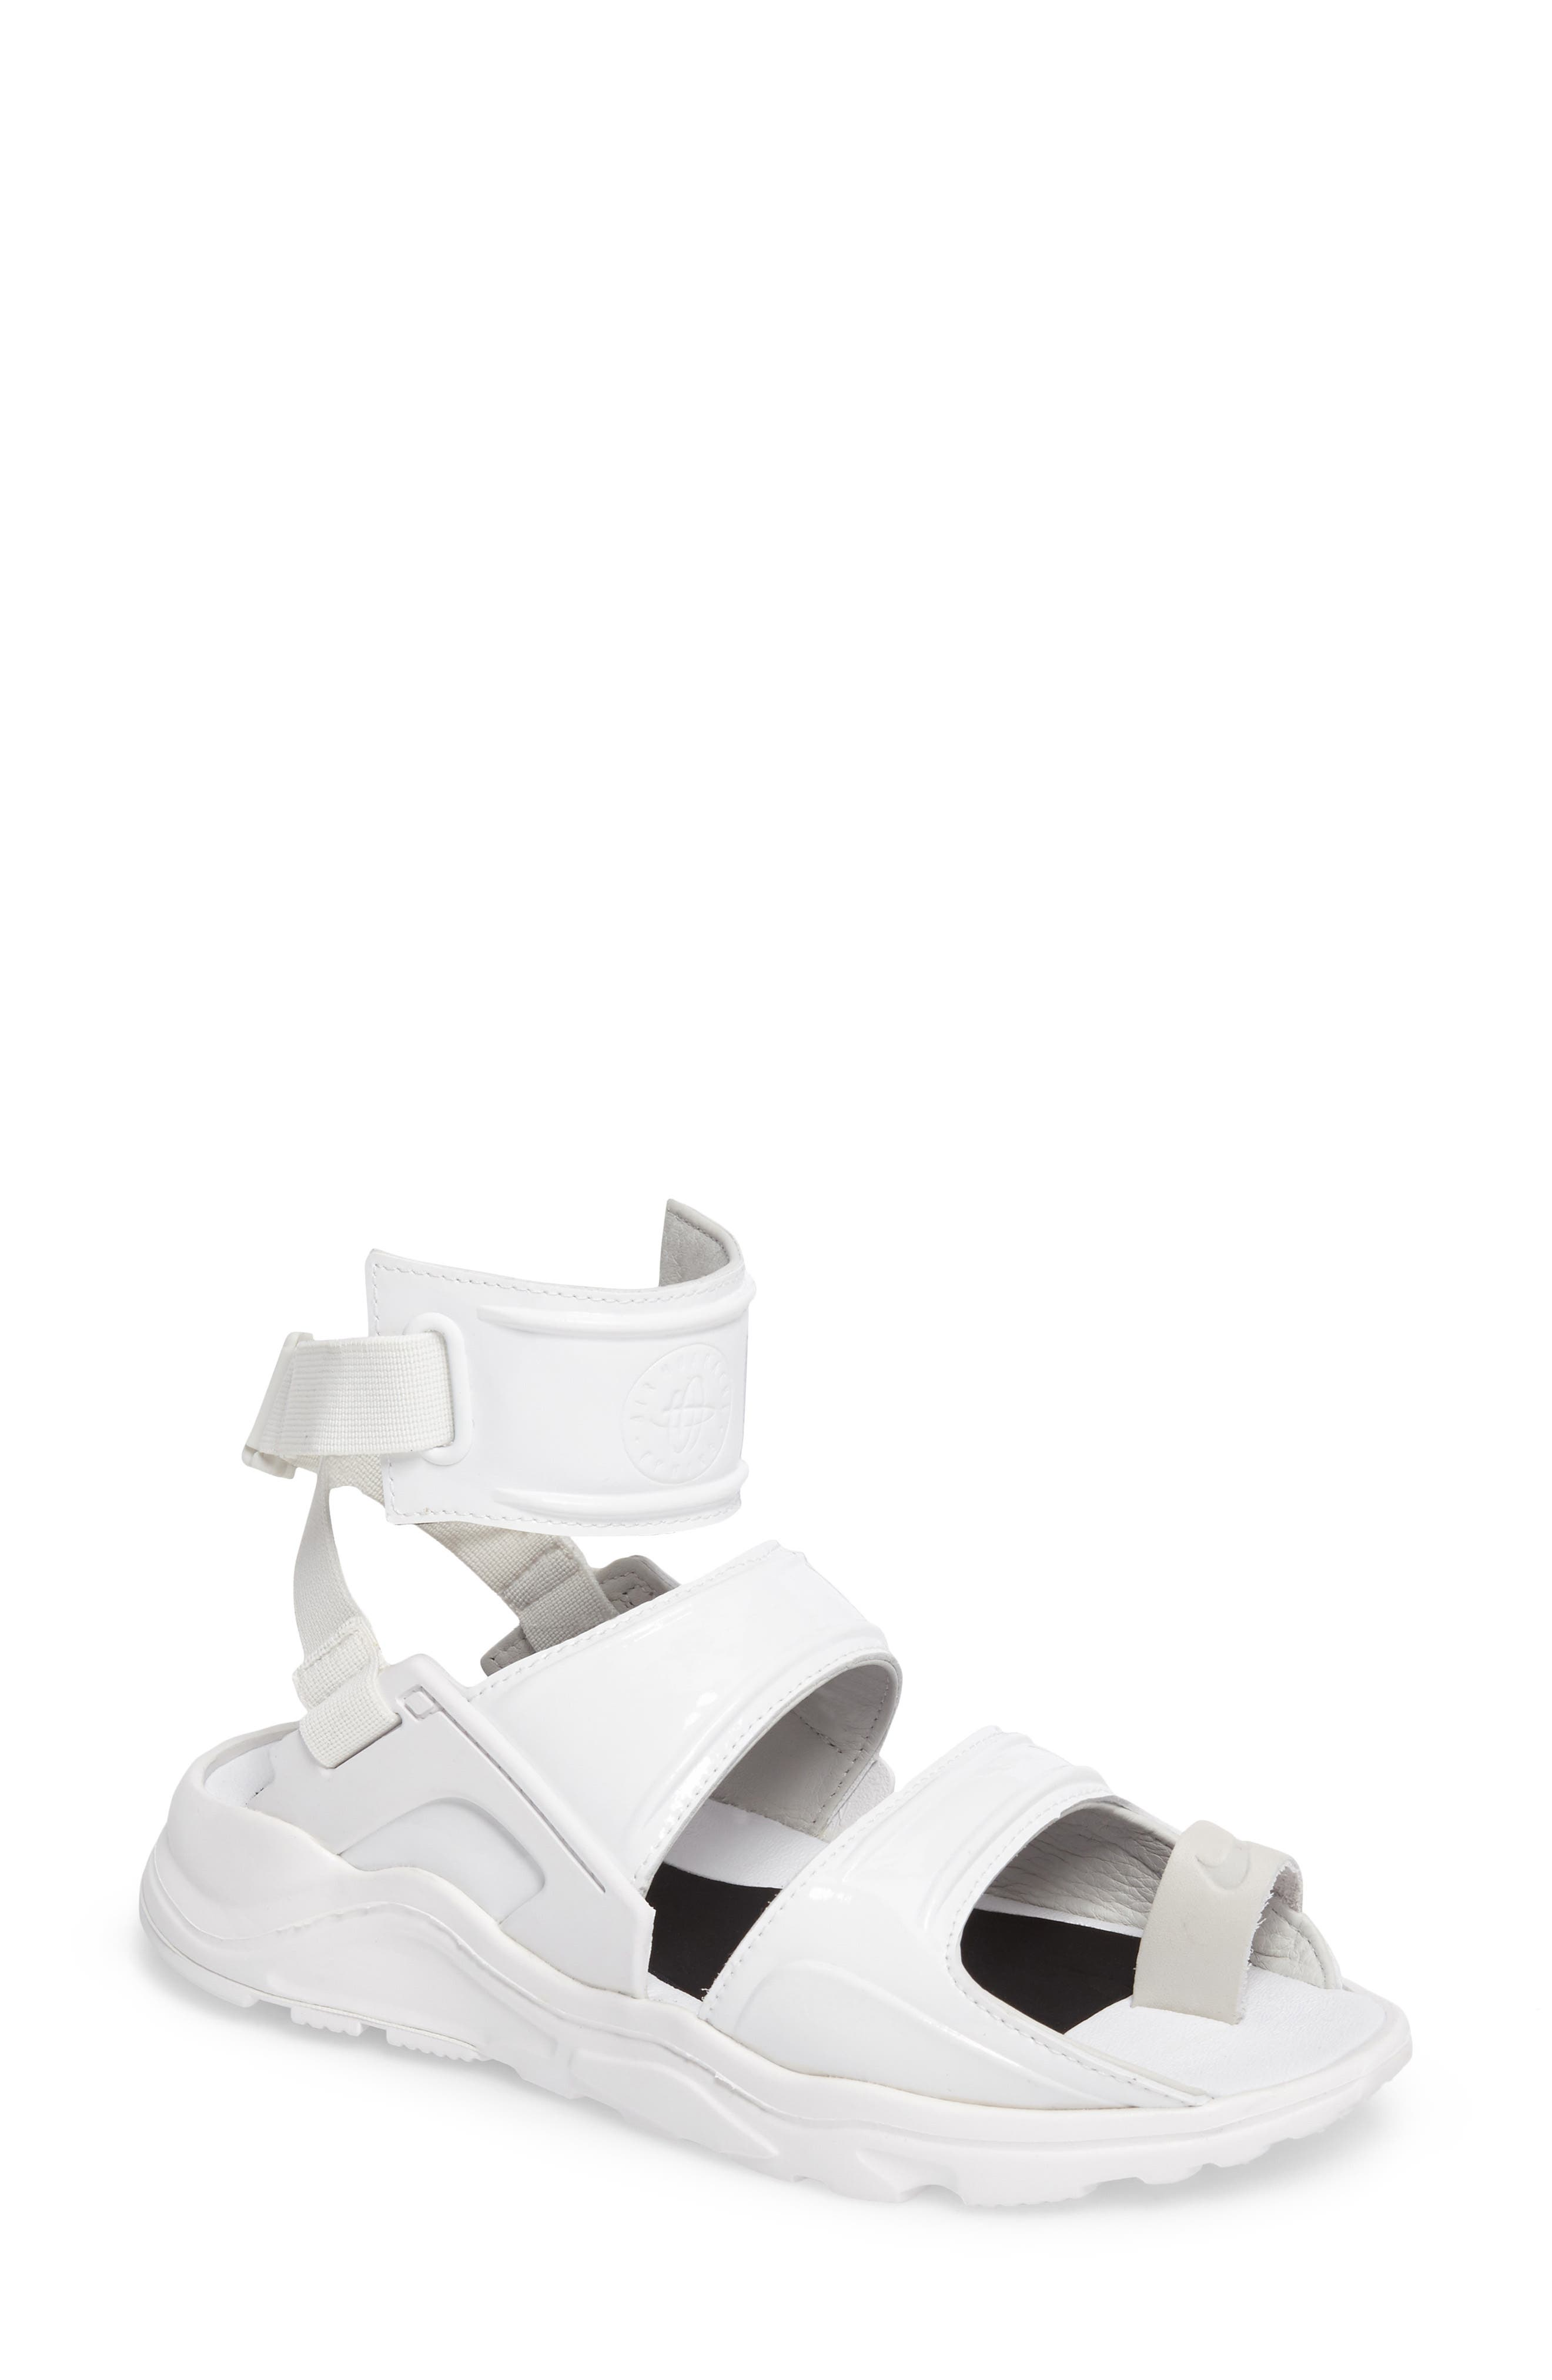 Main Image - Nike Air Huarache Gladiator Sandal (Women)